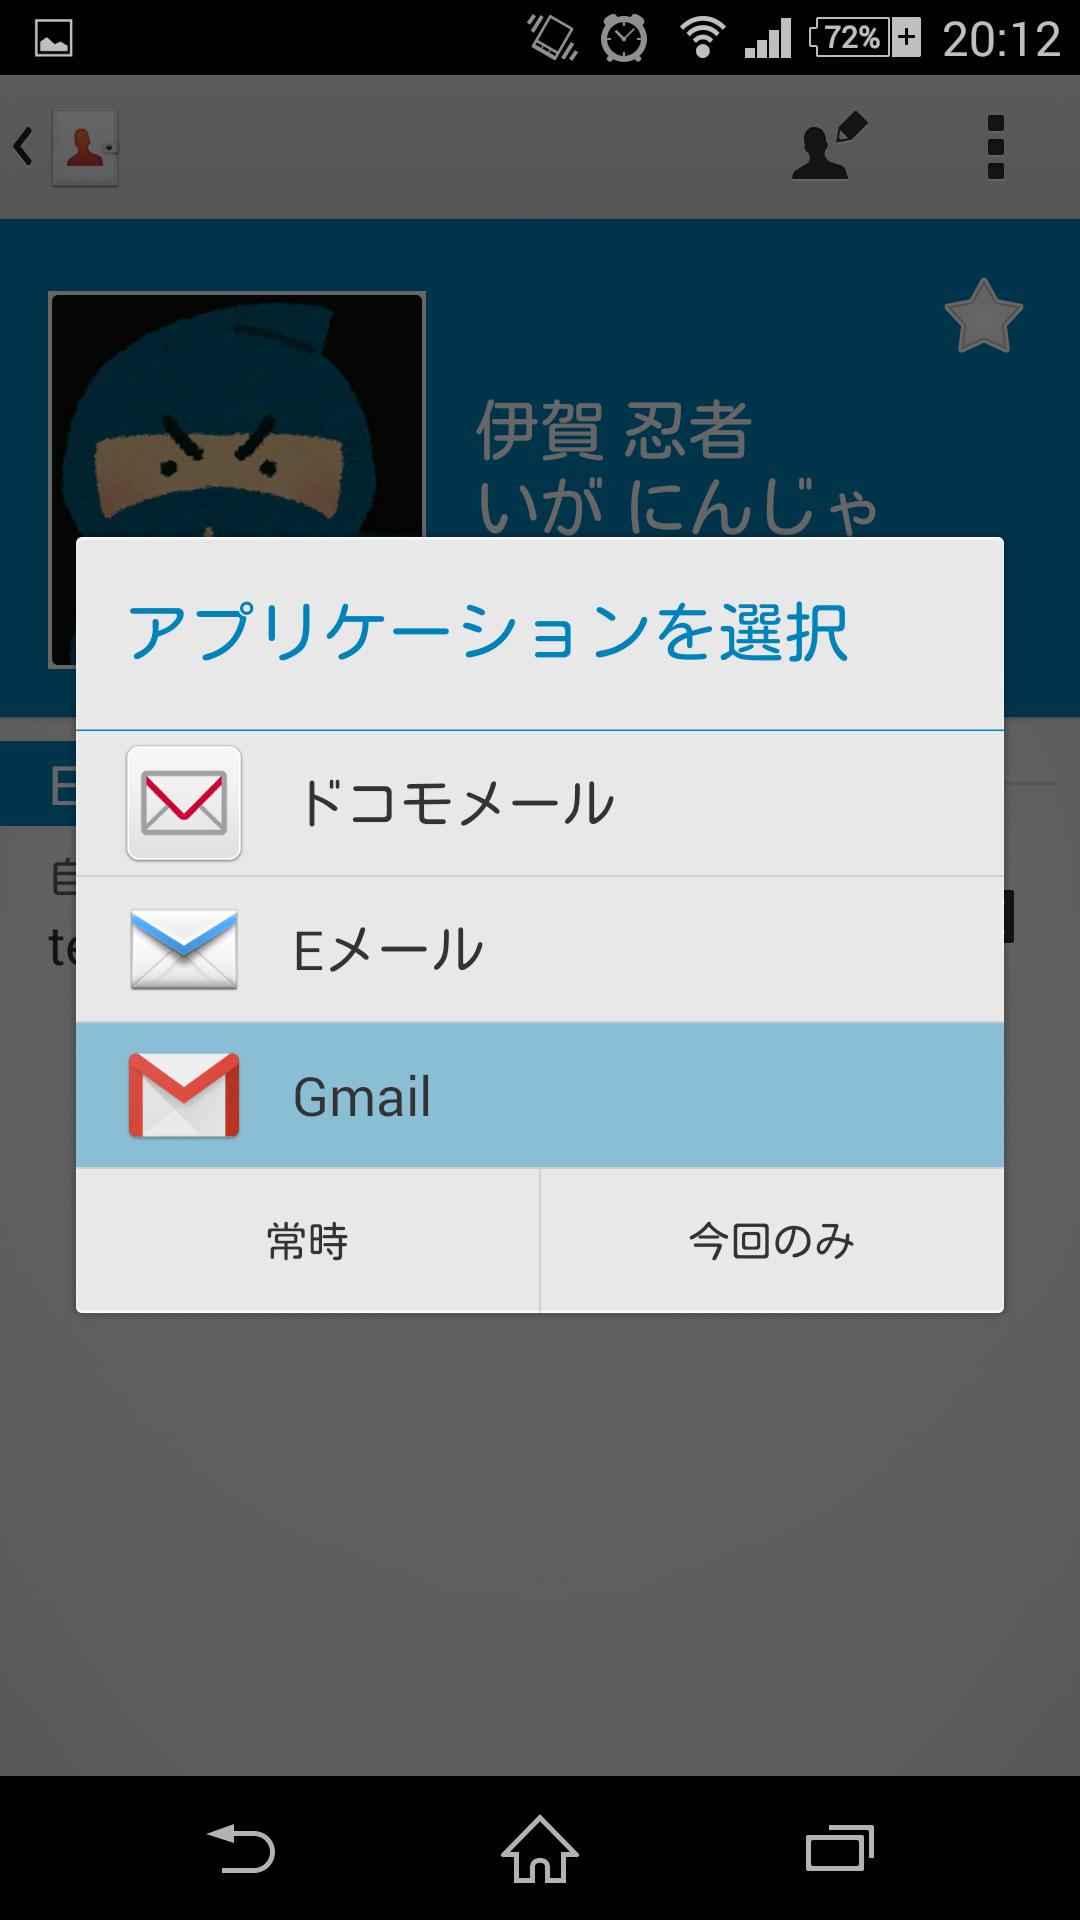 Screenshot_2015-02-05-20-12-08